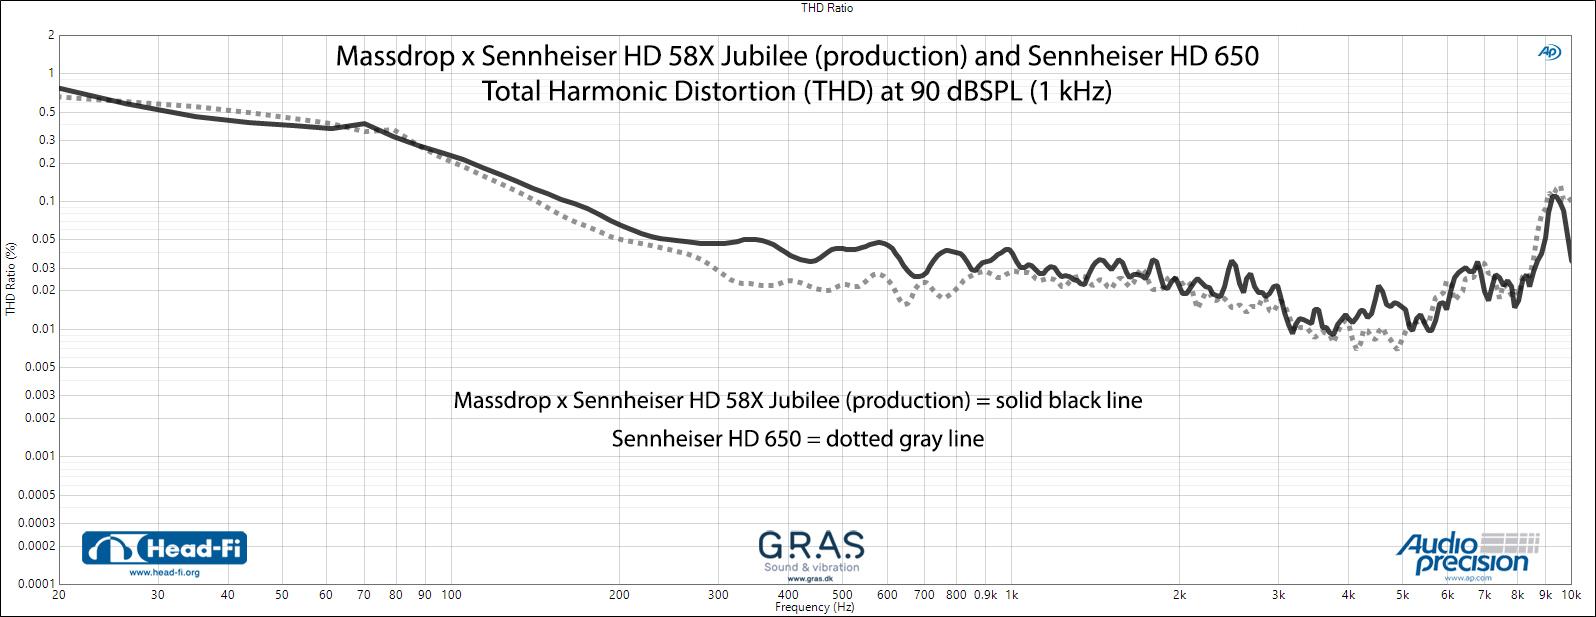 THD_58X-prod_versus_650.jpg